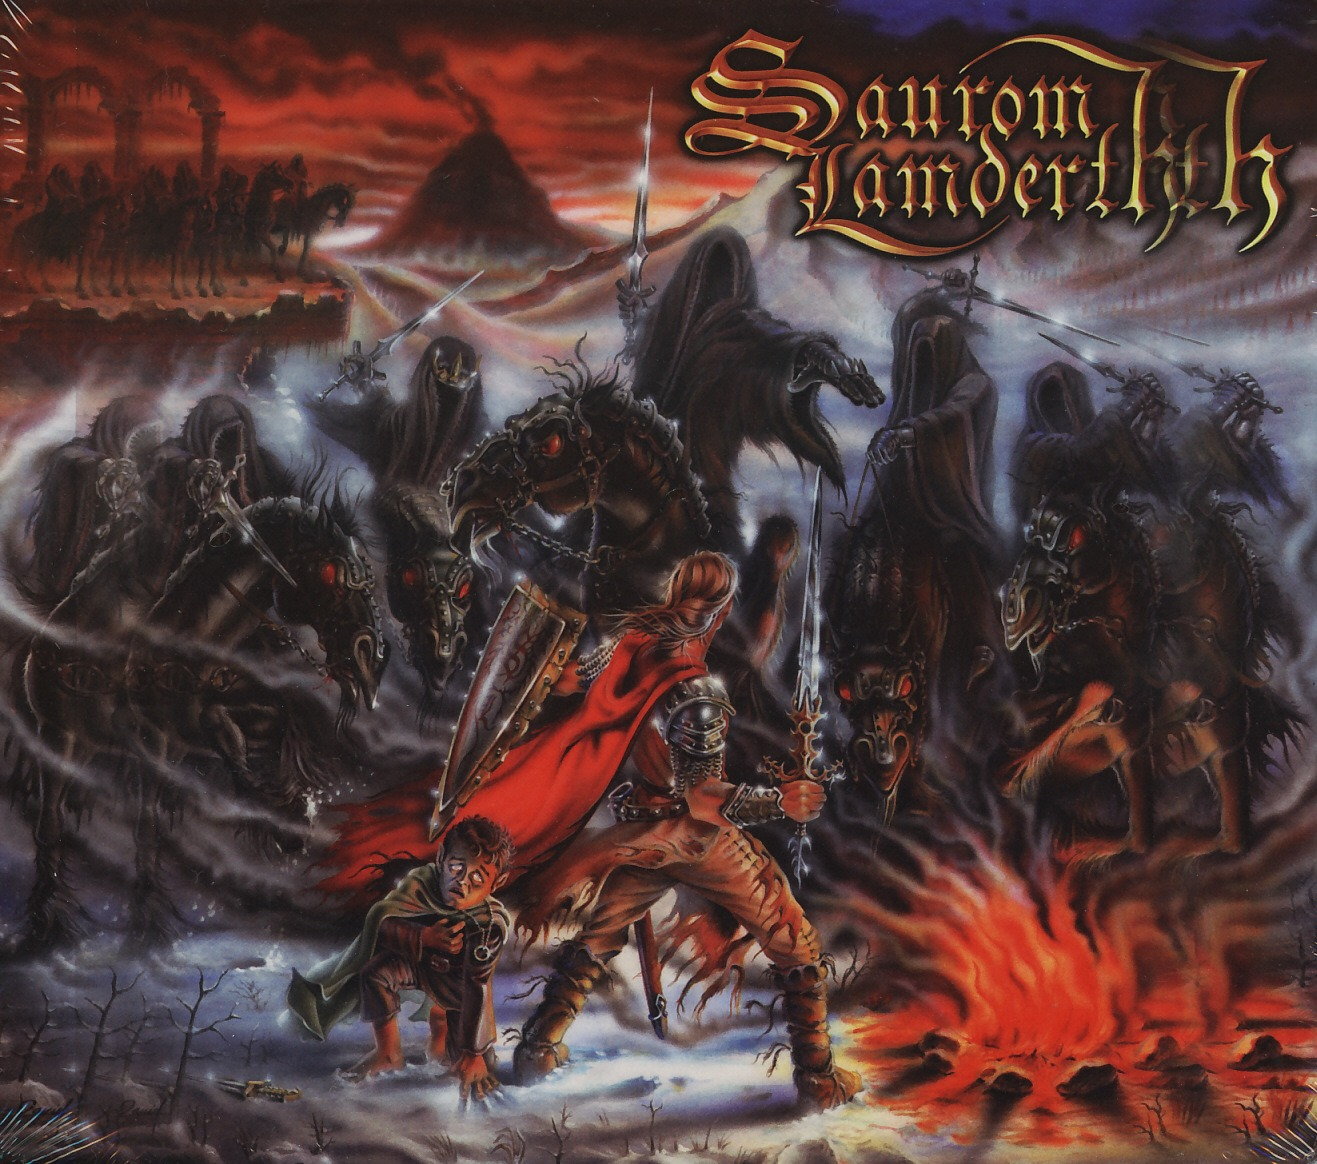 SAUROM LAMDERTH (Spain) / Sombras Del Este (2CD)